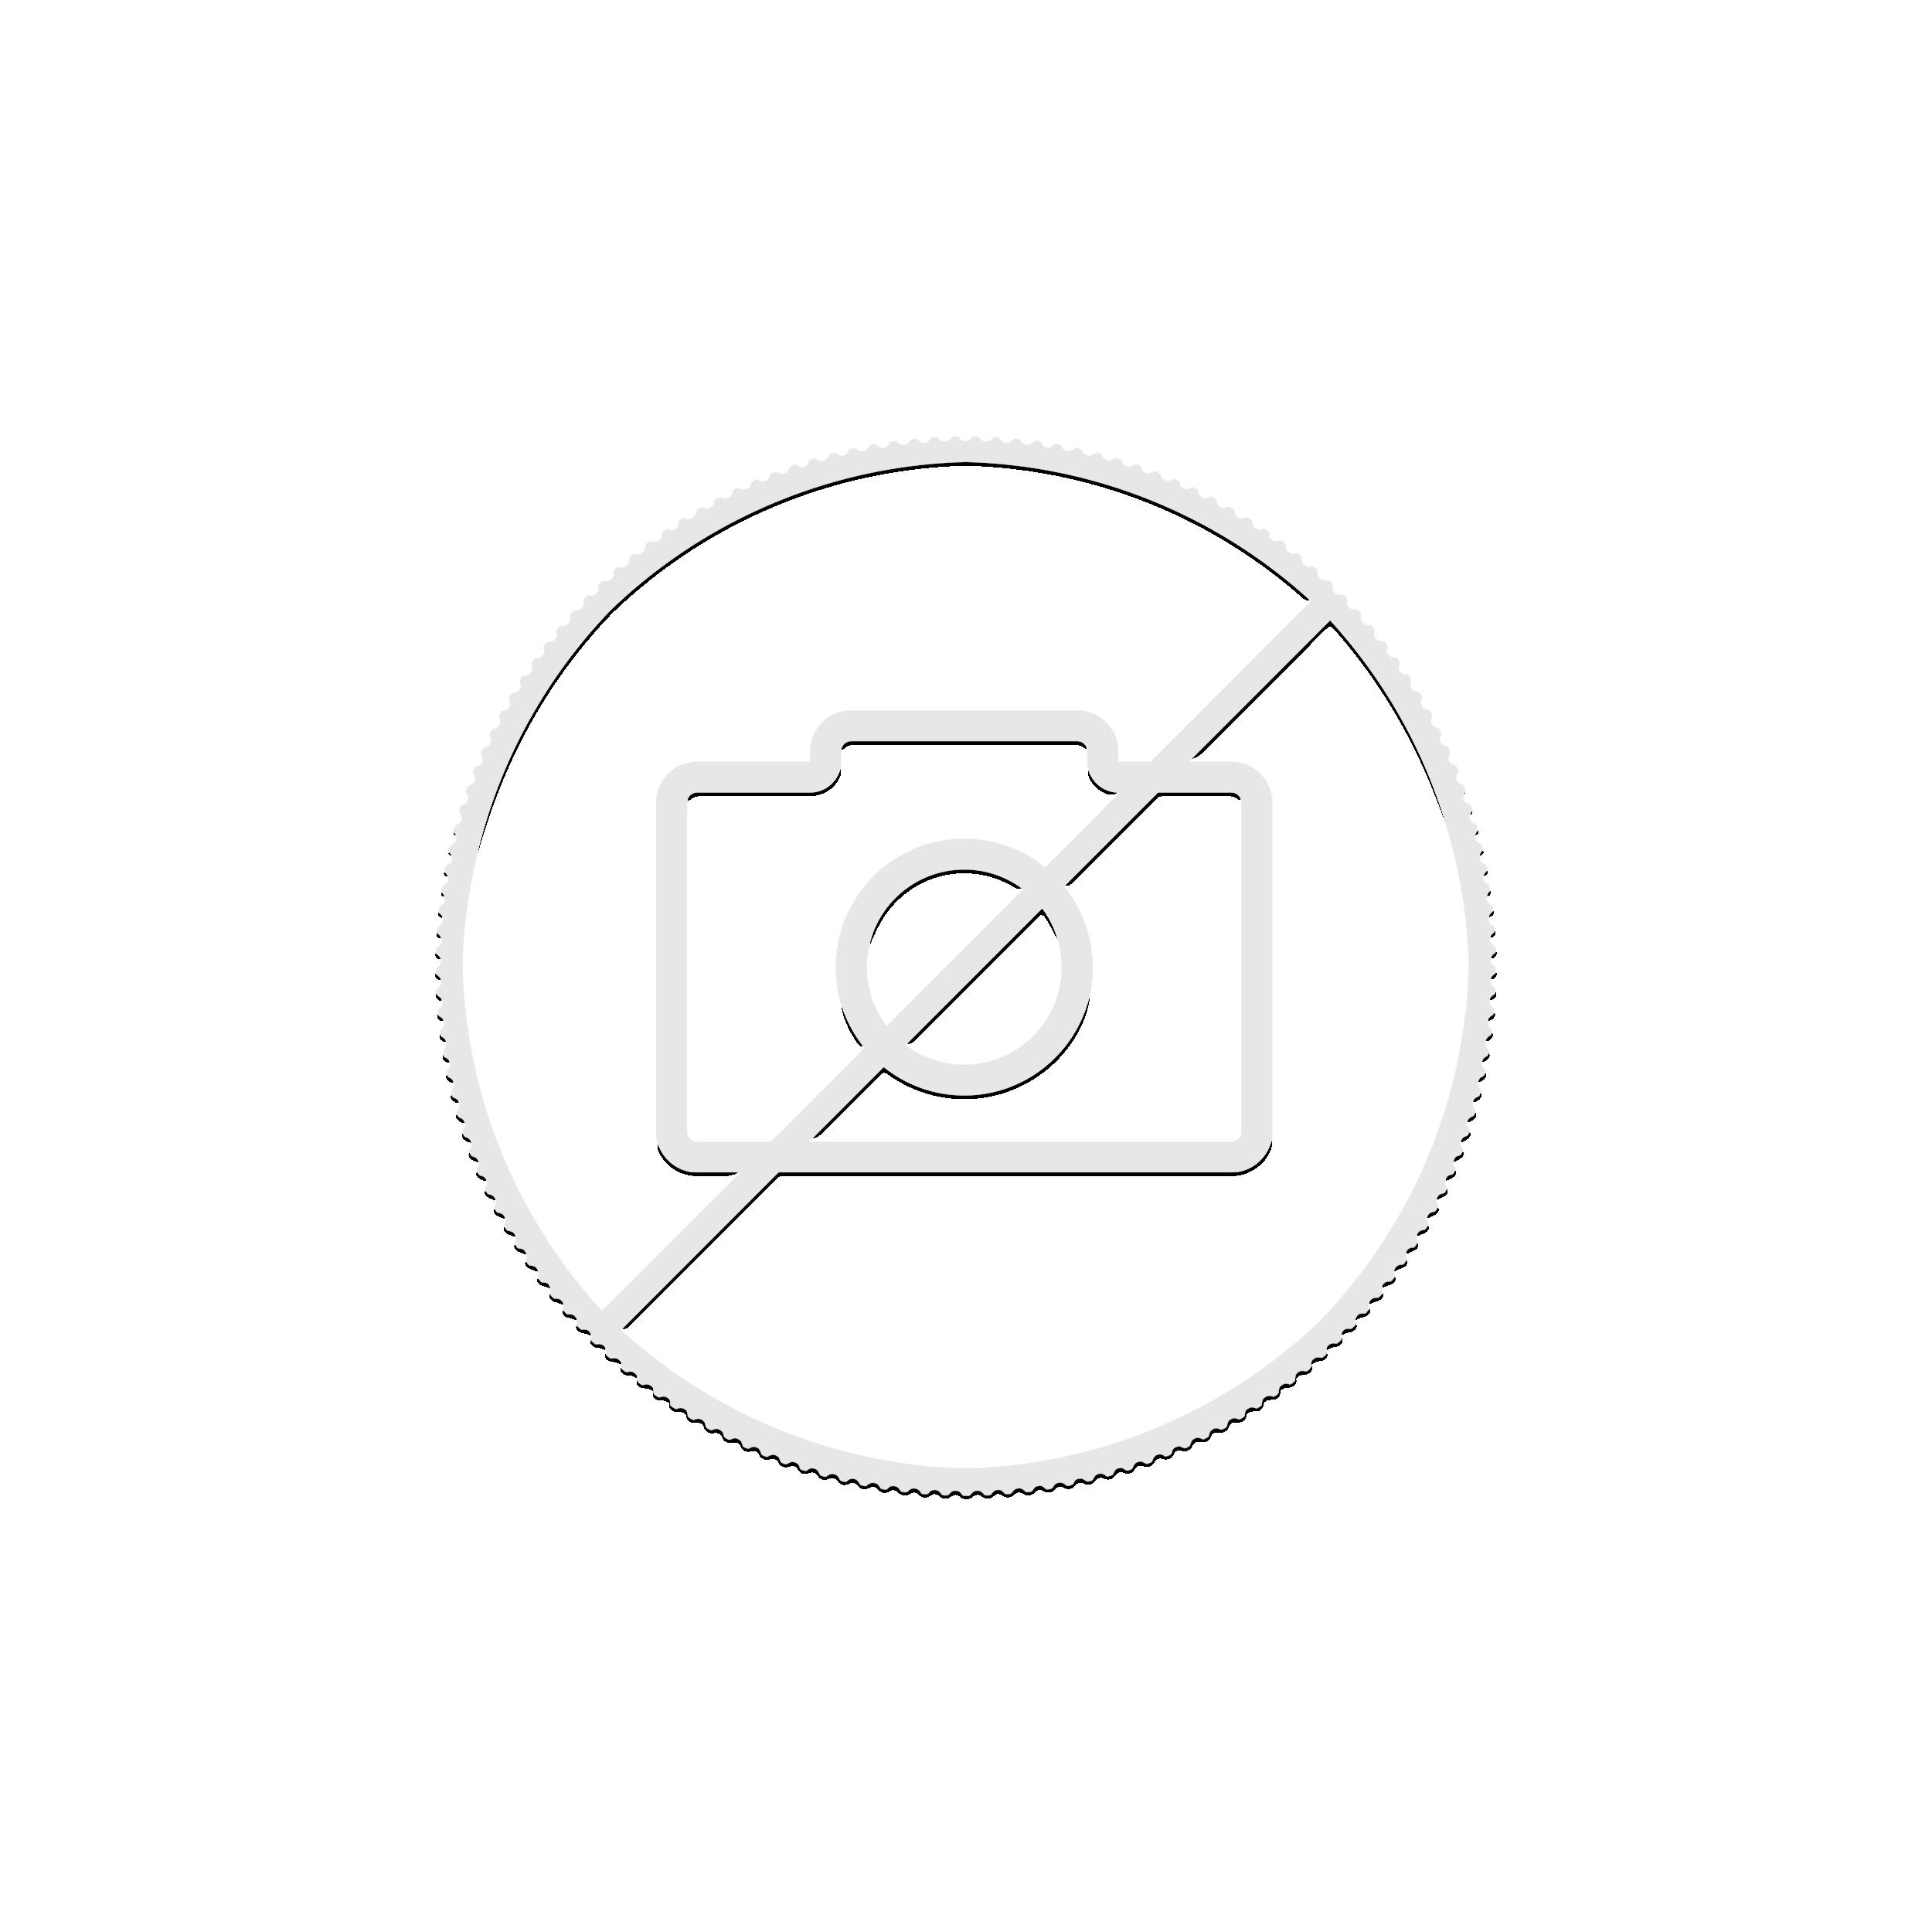 Germania Beast Fafnir 1 troy ounce zilveren munt 2020